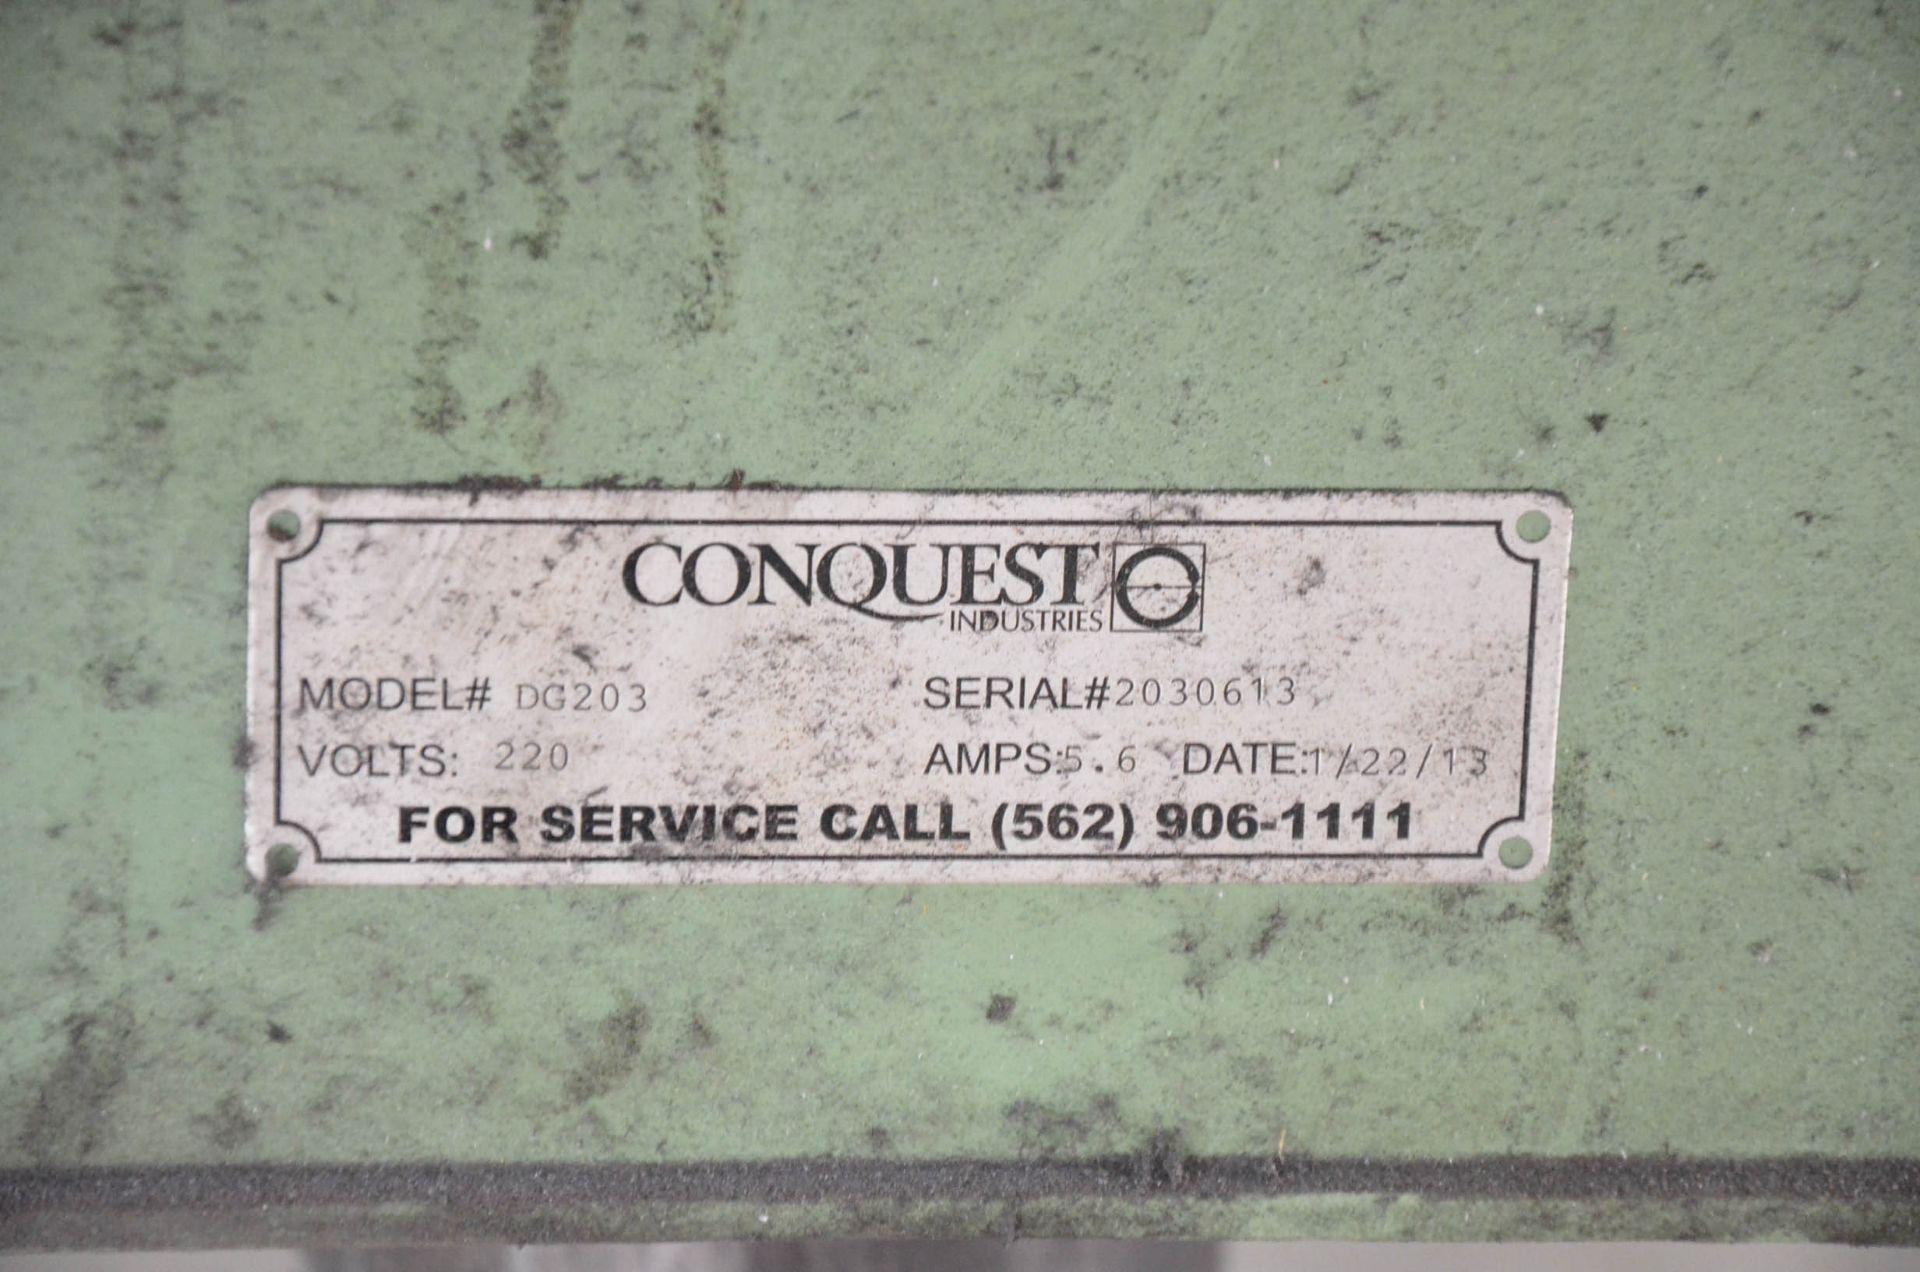 "CONQUEST (2013) DG203 20"" VERTICAL DISK SANDER WITH 15""X27"" TILTING TABLE, 220V/3PH/60HZ, S/N - Image 2 of 2"